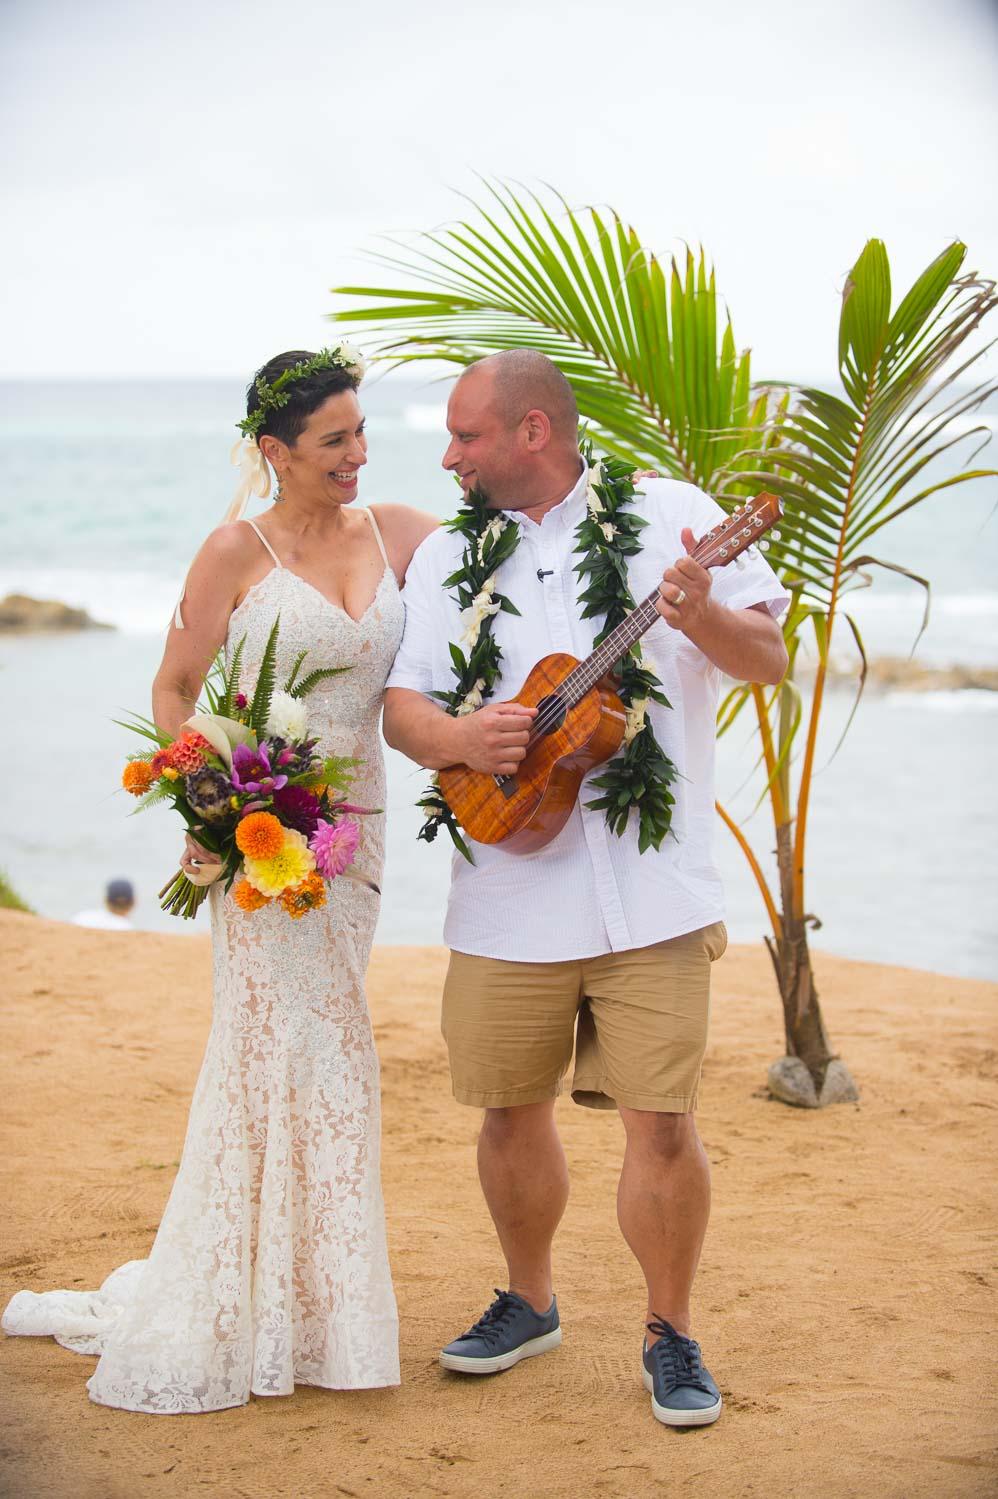 maui-wedding-photography-maui-wedding-venue-Tad-Craig-Photography-25.jpg